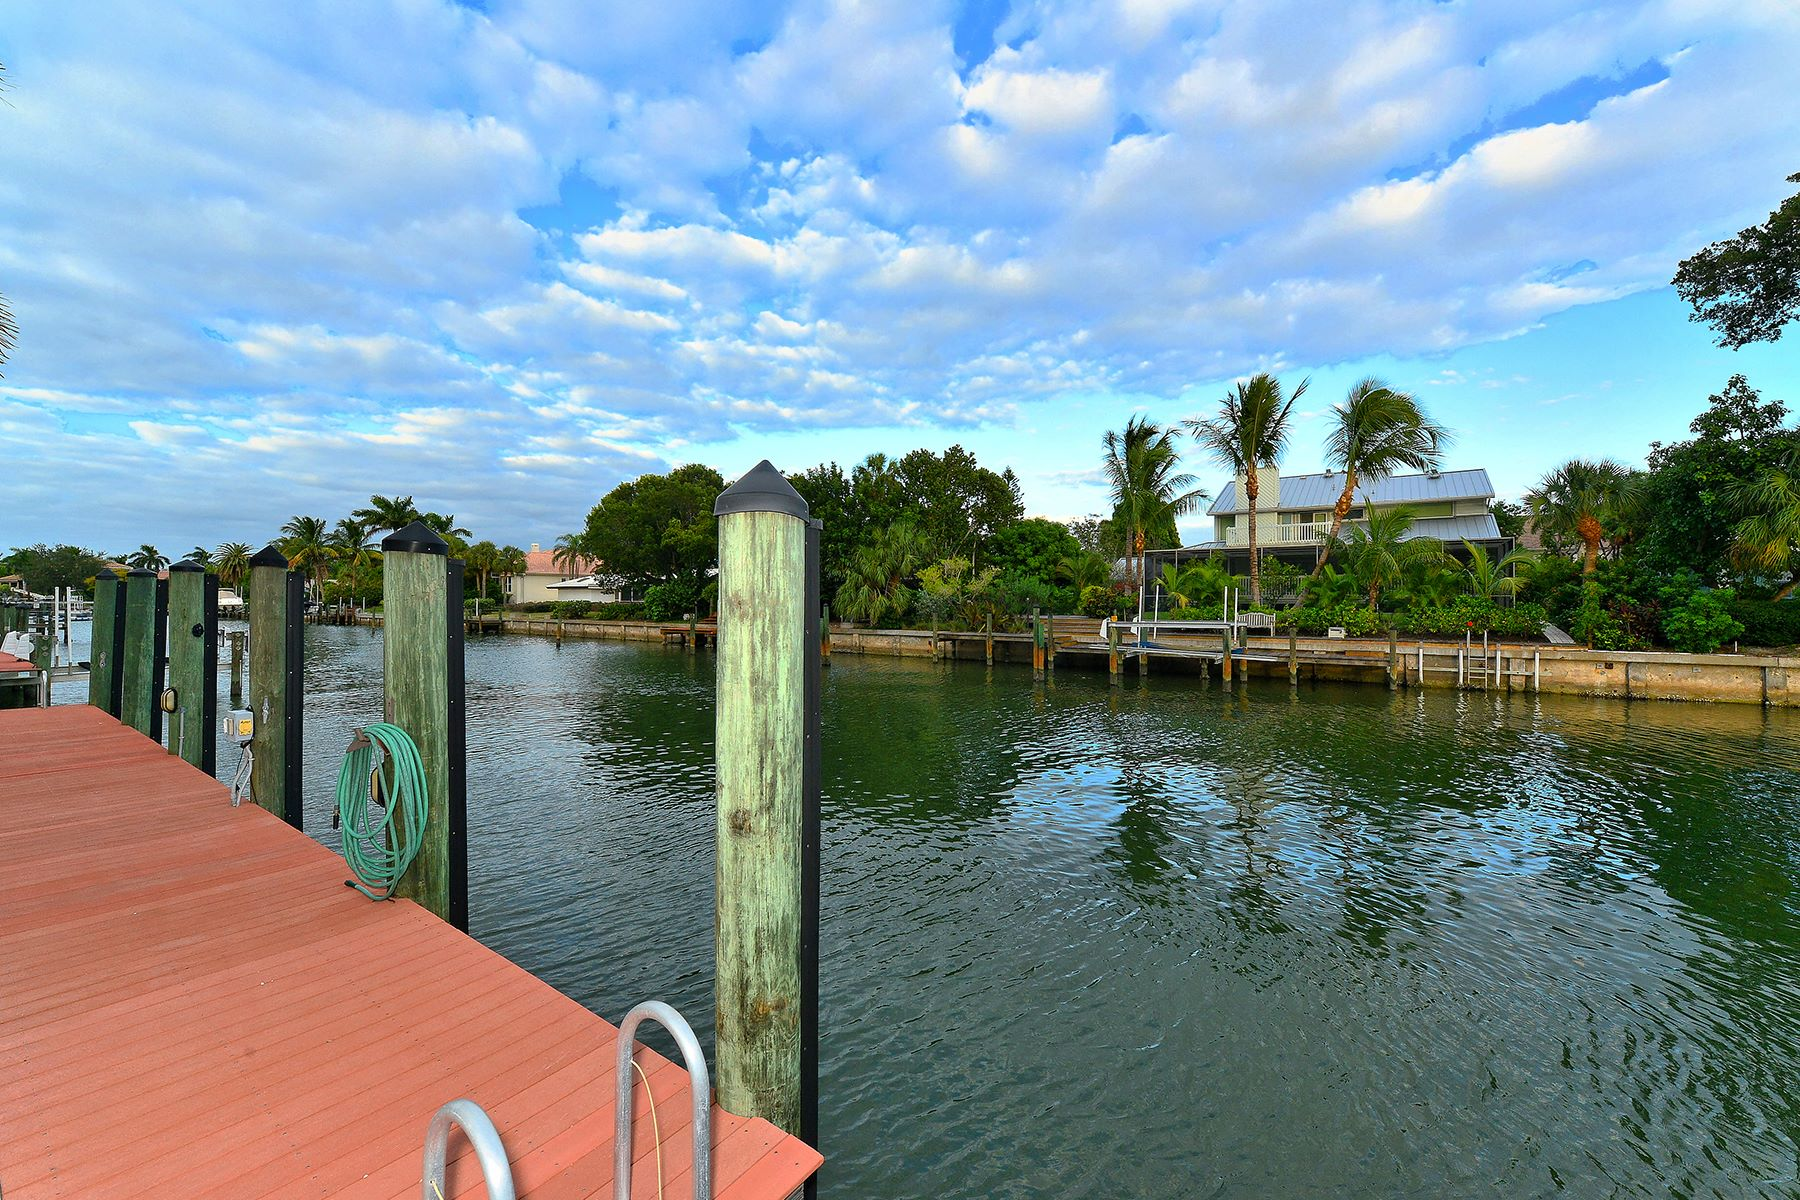 Casa Unifamiliar por un Venta en BIRD KEY 476 Partridge Cir Bird Key, Sarasota, Florida, 34236 Estados Unidos